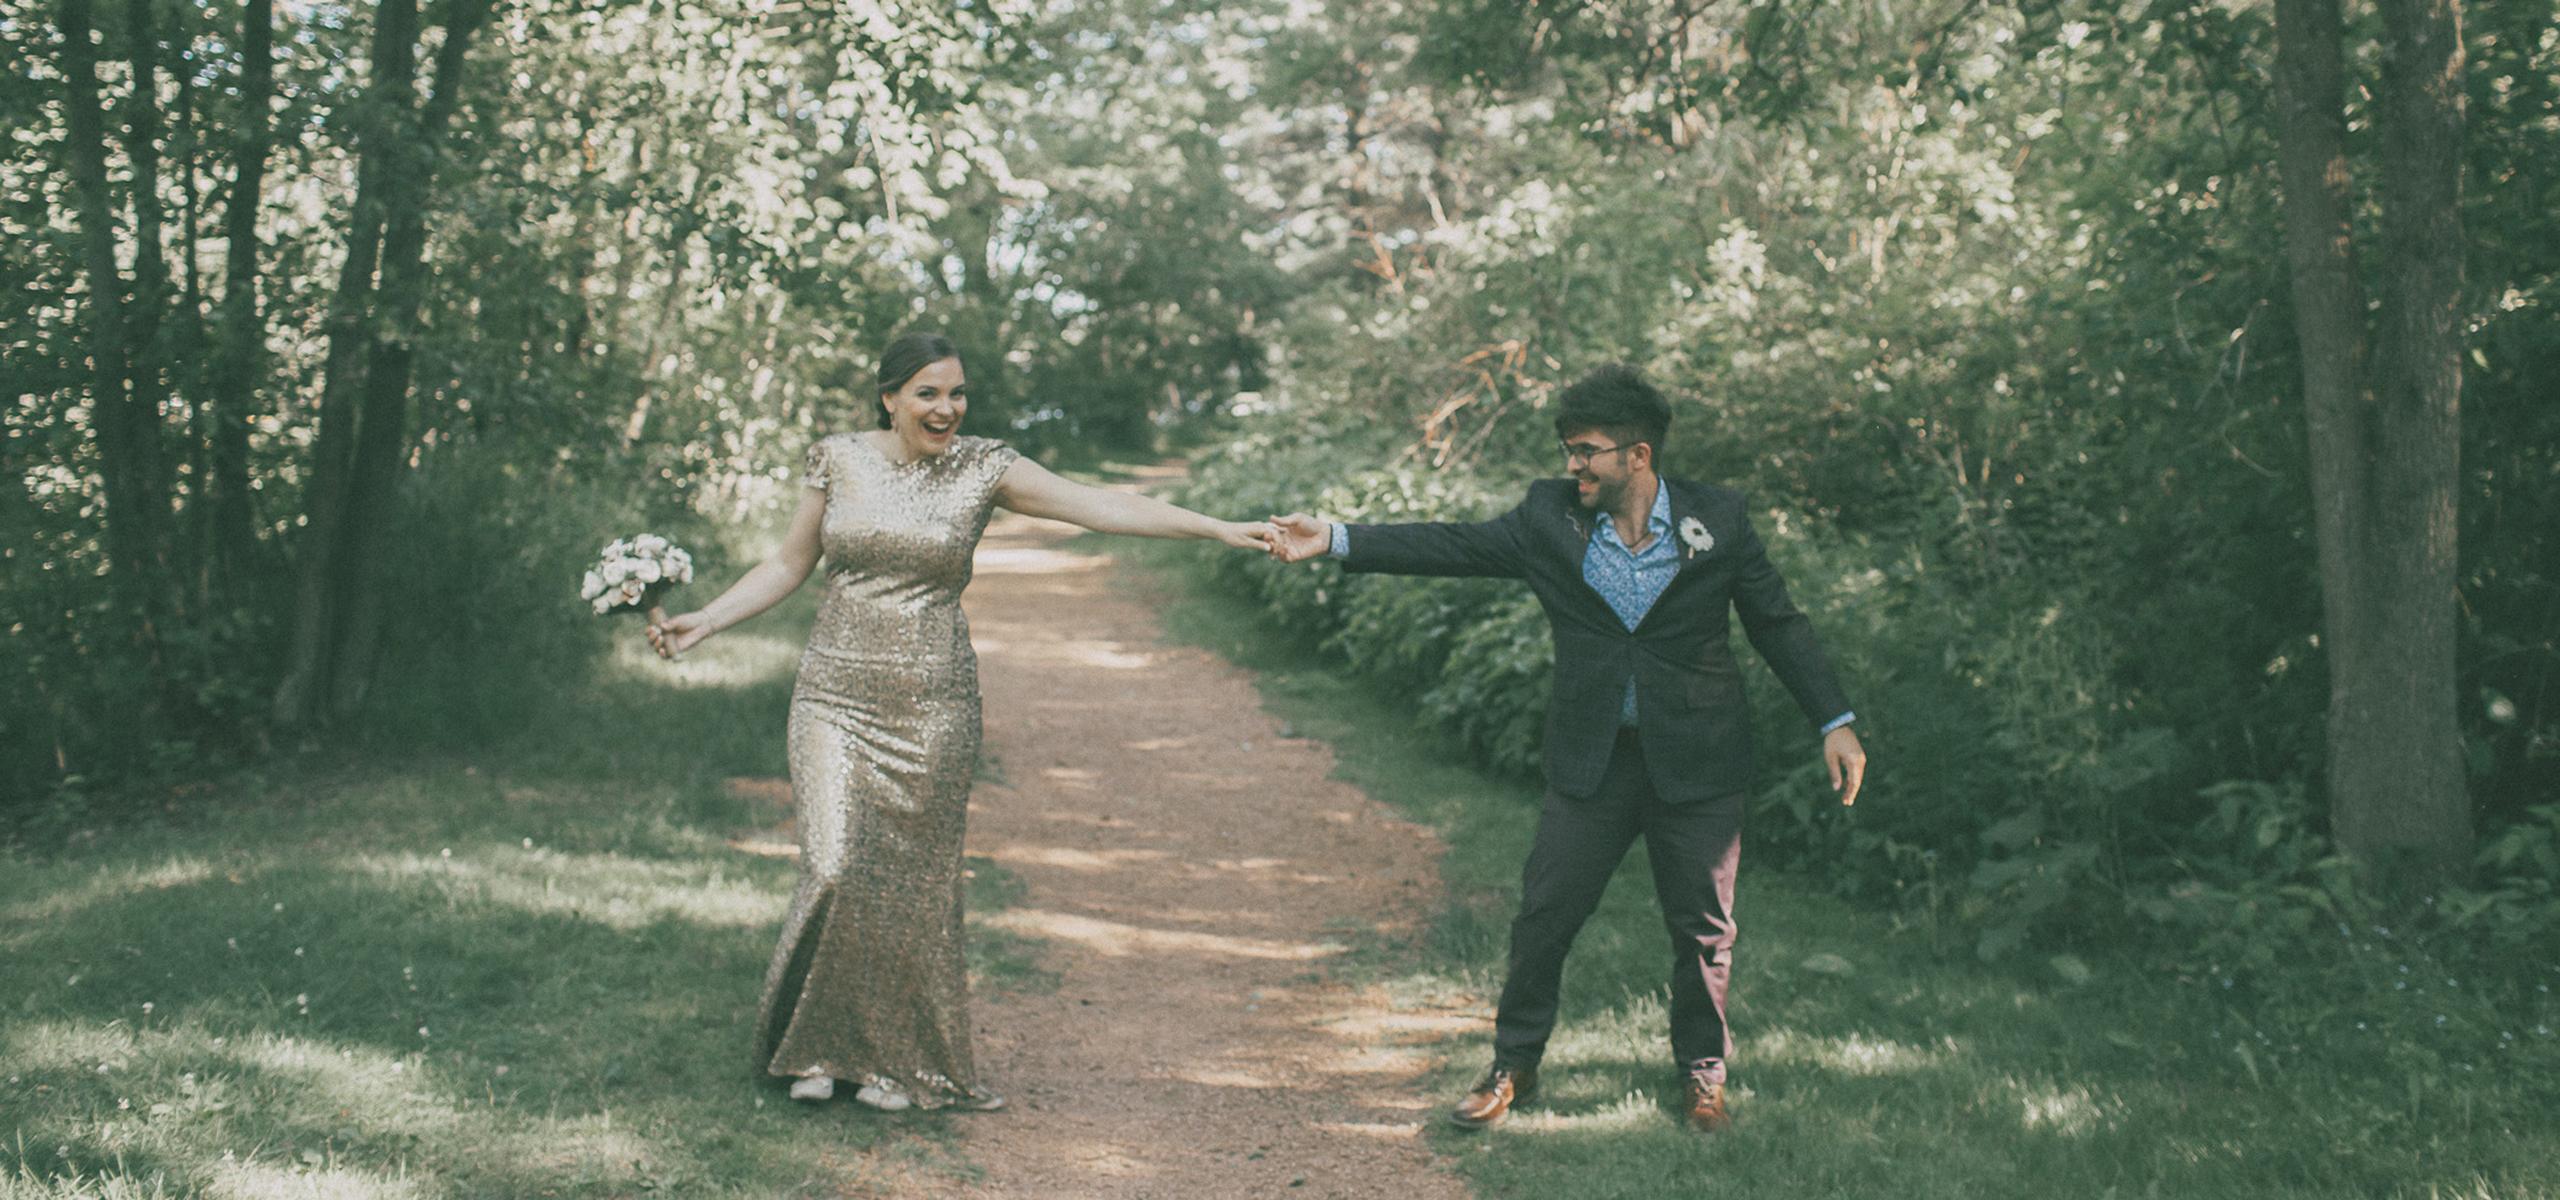 St Cloud Minnesota Wedding Photography + Elopement Photography